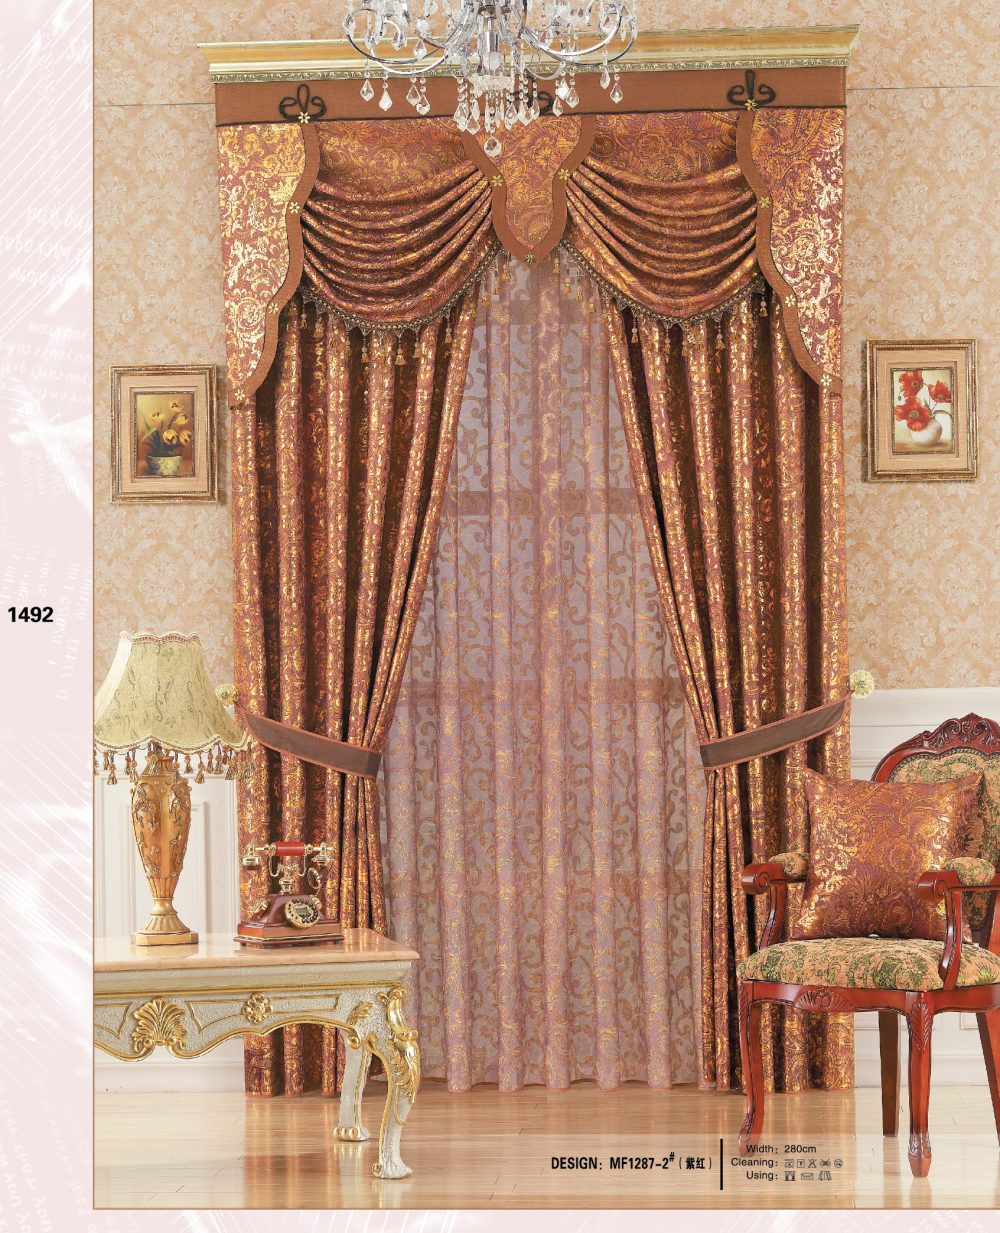 Aiden 收藏窗帘图片高清图(用方案里很清晰。)免费~_4.jpg